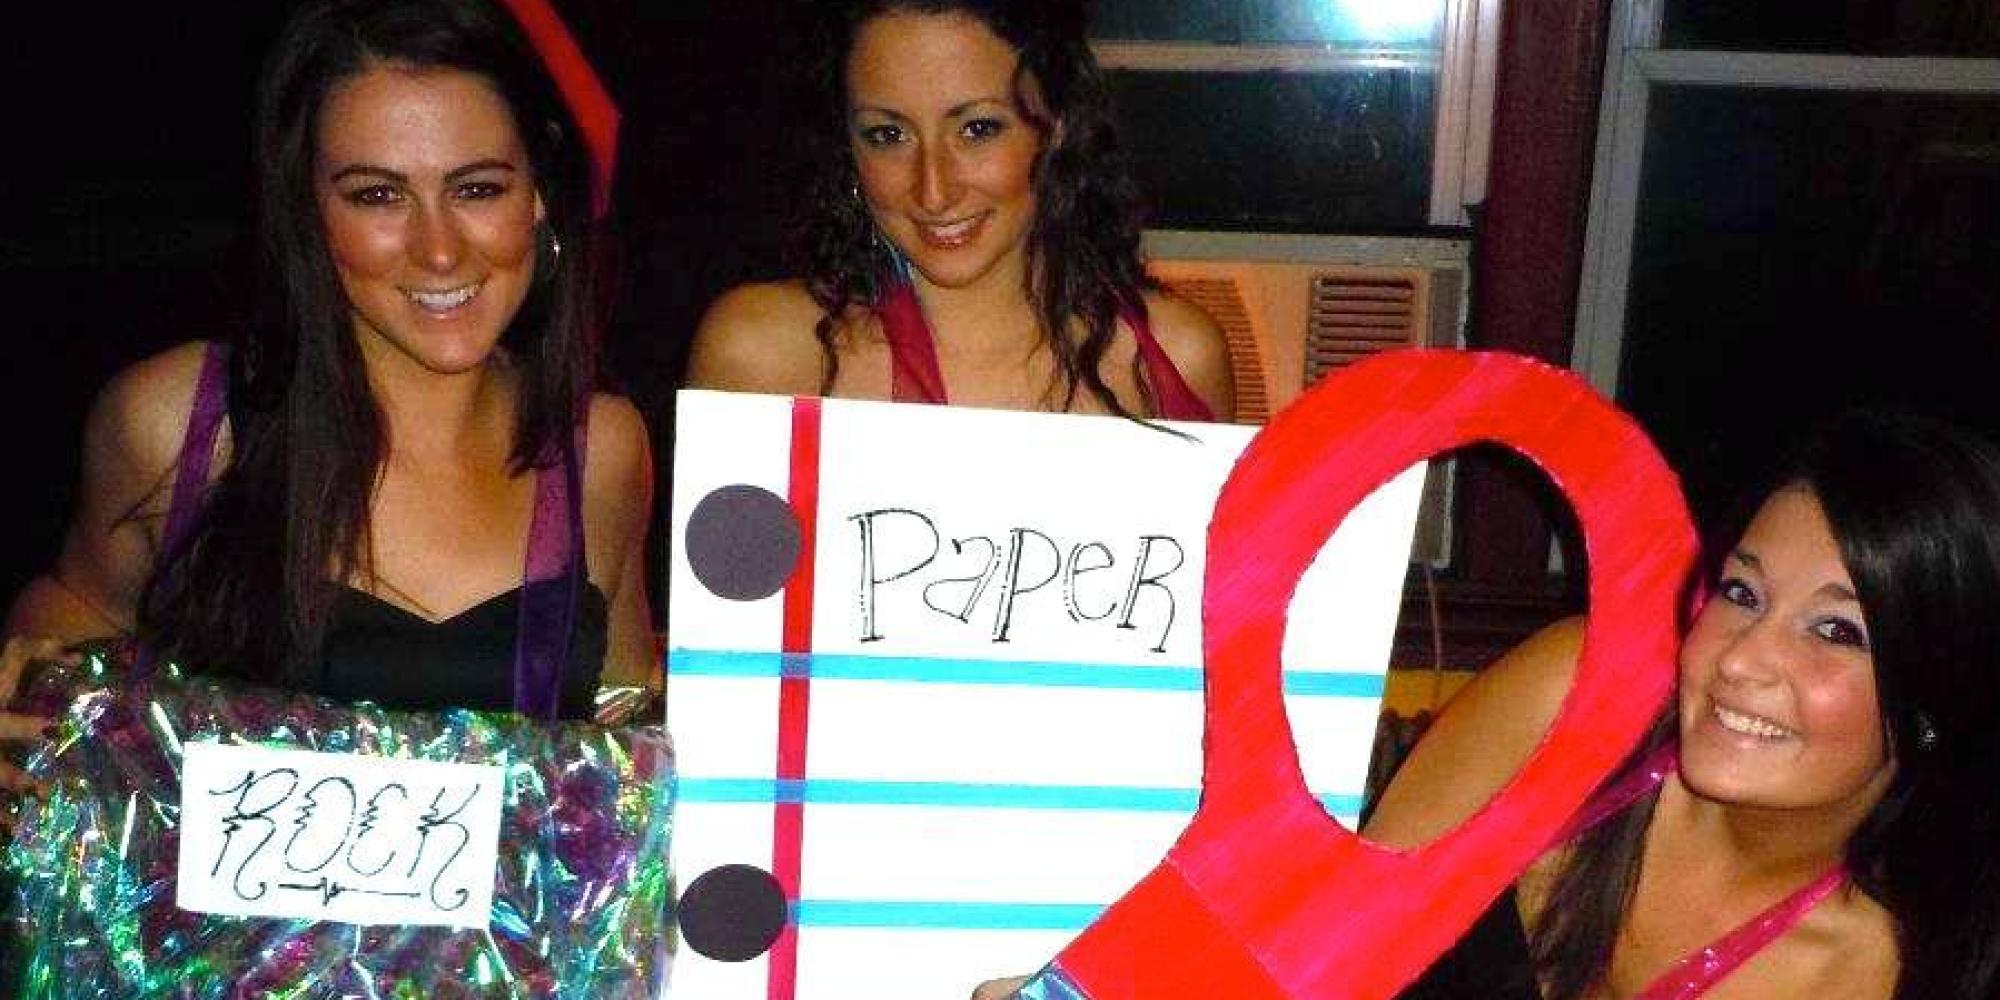 funny costumes ideas 6 widescreen wallpaper funny costumes ideas 6 widescreen wallpaper